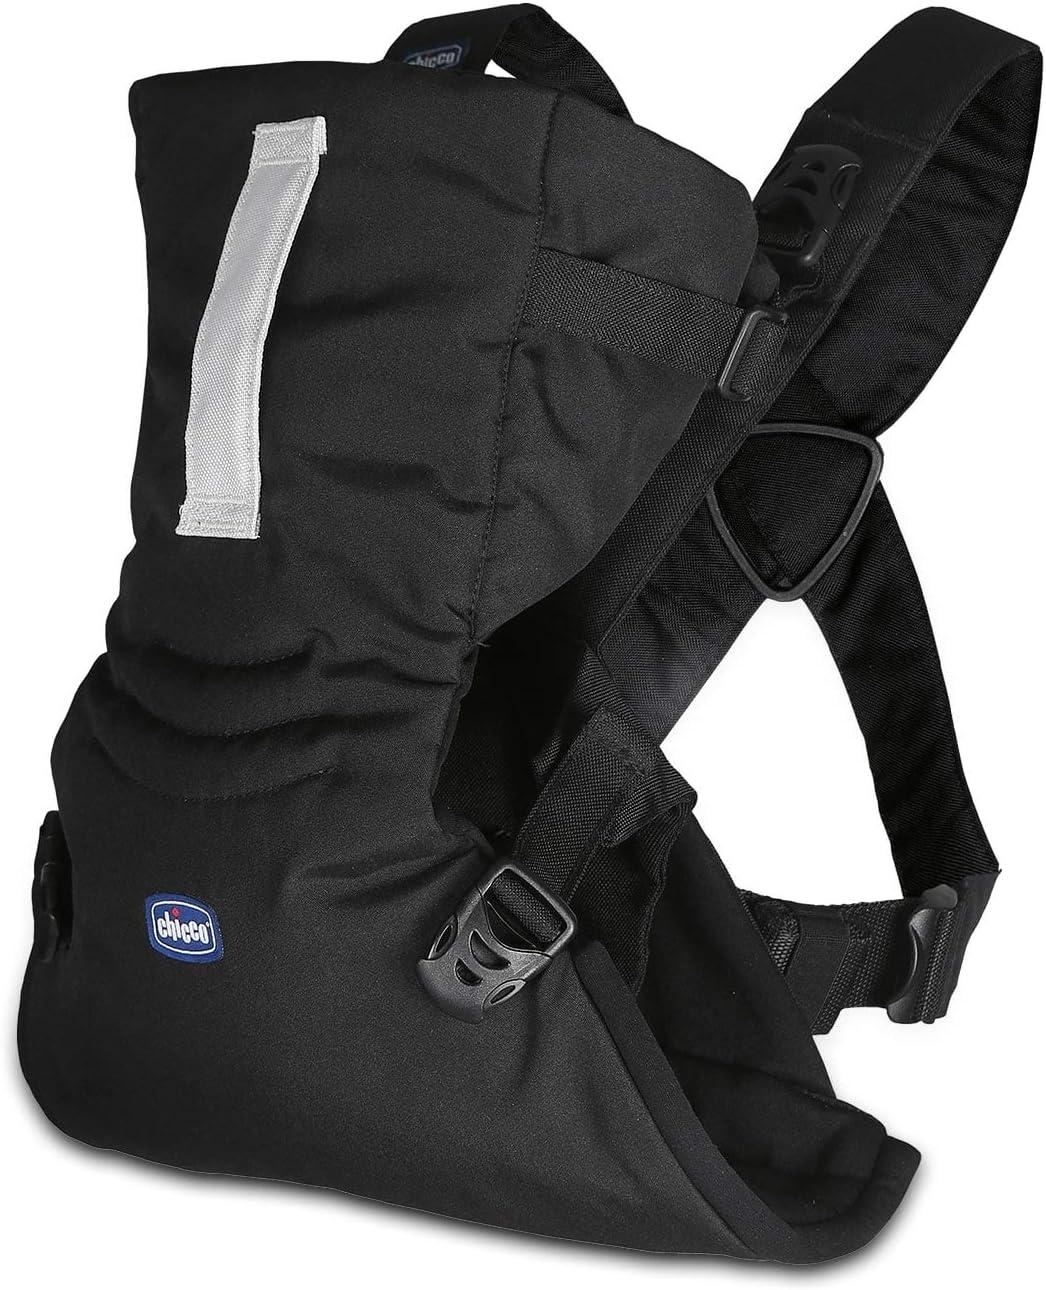 Chicco Easy Fit Mochila ergonómica portabebé, hasta 9 kg, color negro (Black Night)